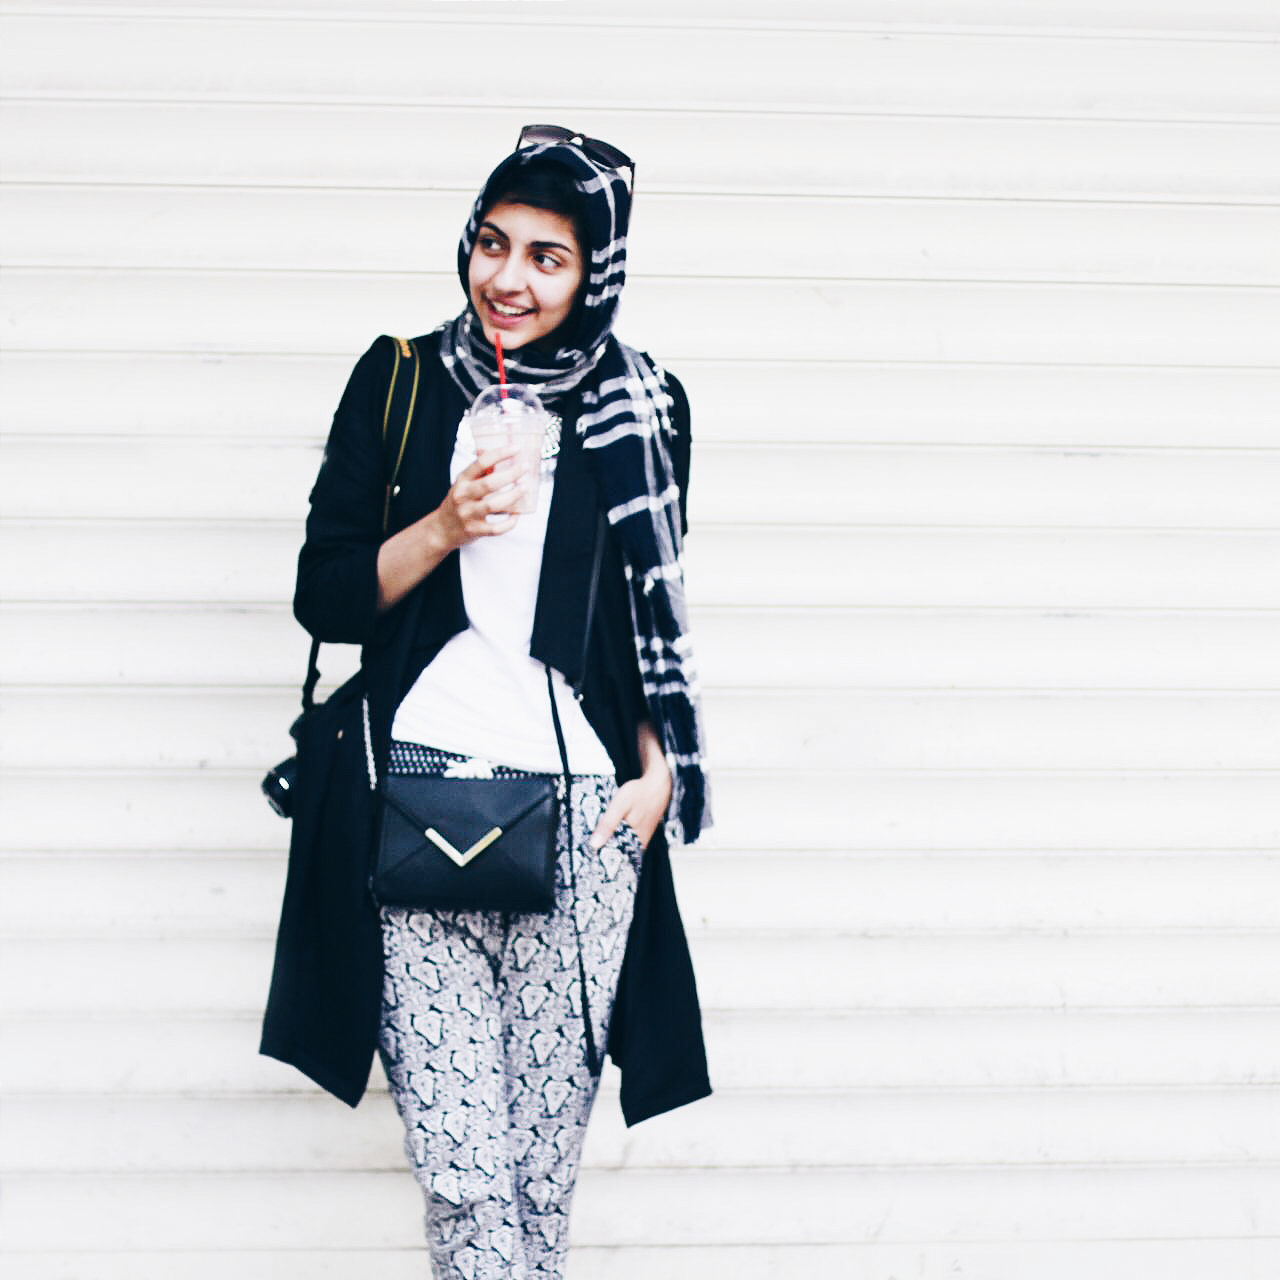 fashion, iran fashion, iranian fashion, tehran fashion, hijab fashion, hijabi fashion, iran streetstyle, streetstyle blog